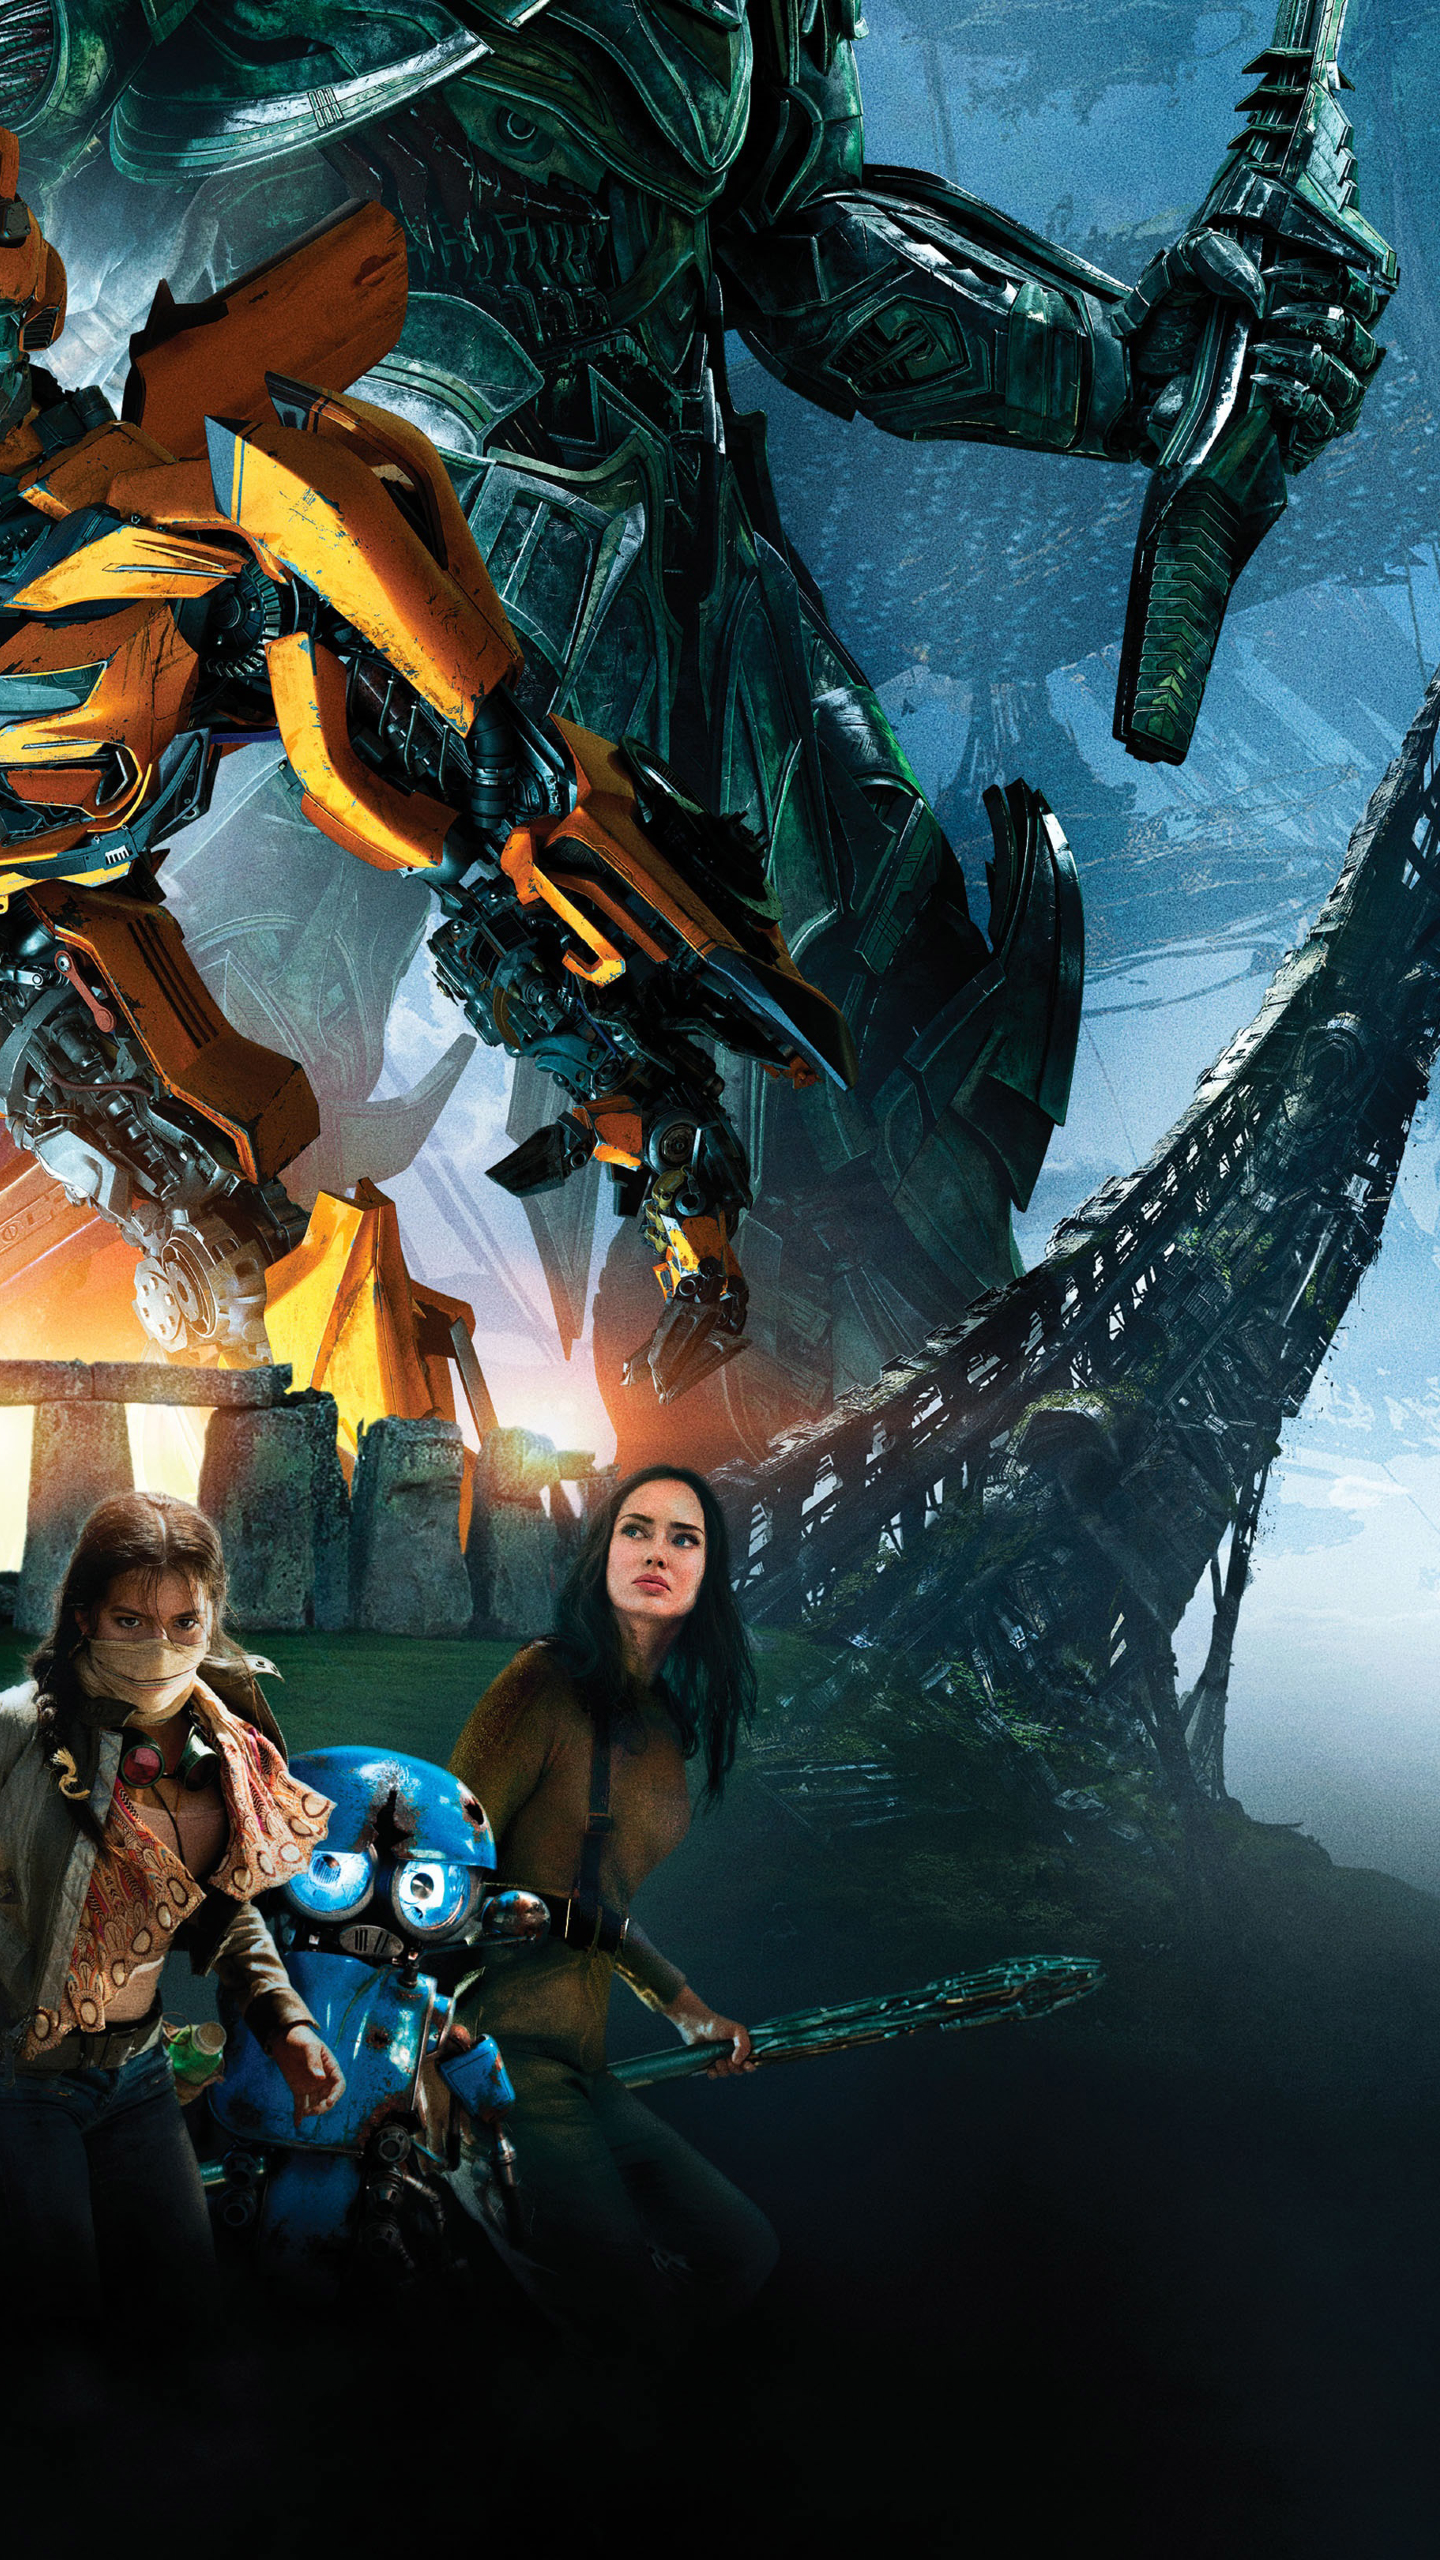 Transformers 5 Movie Poster, HD 4K Wallpaper